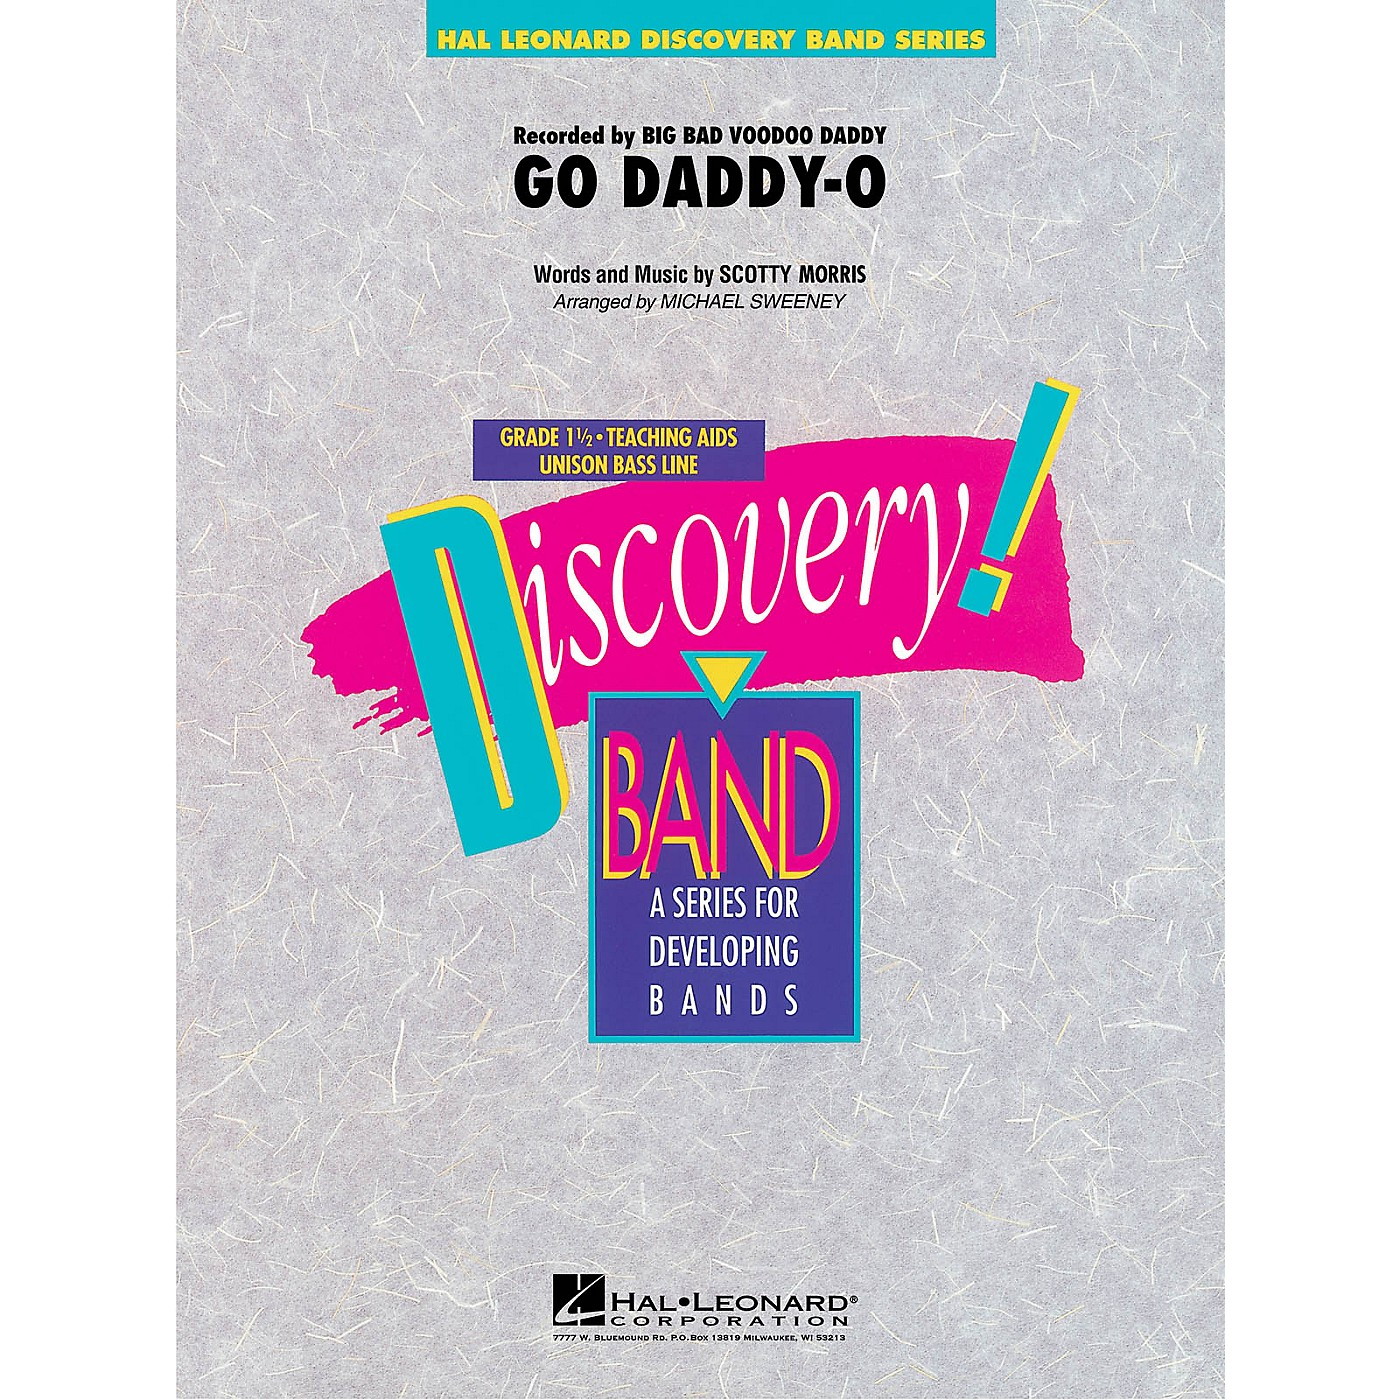 Hal Leonard Go Daddy-O Concert Band Level 1 1/2 Arranged by Michael Sweeney thumbnail